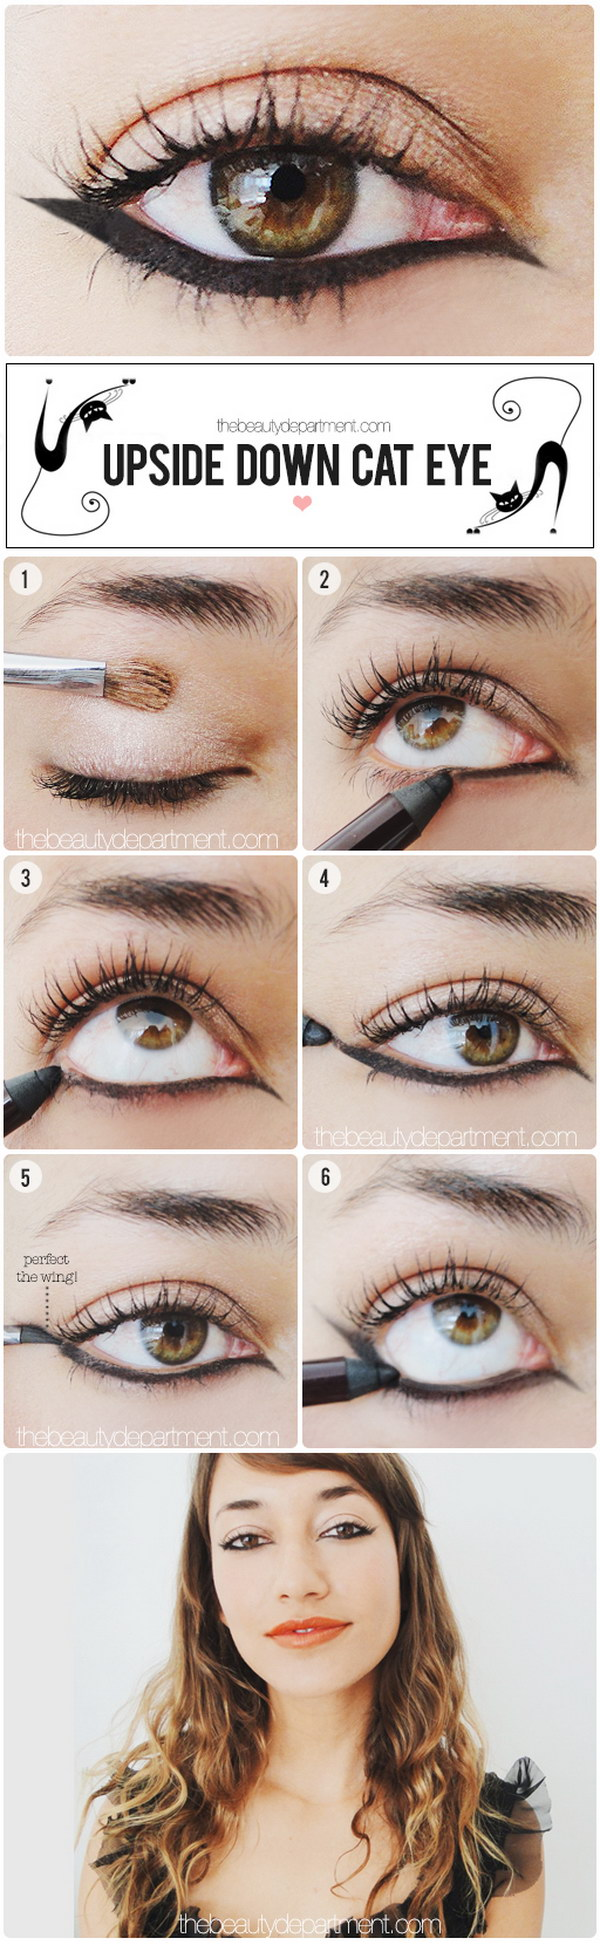 Upside down cat eye makeup.